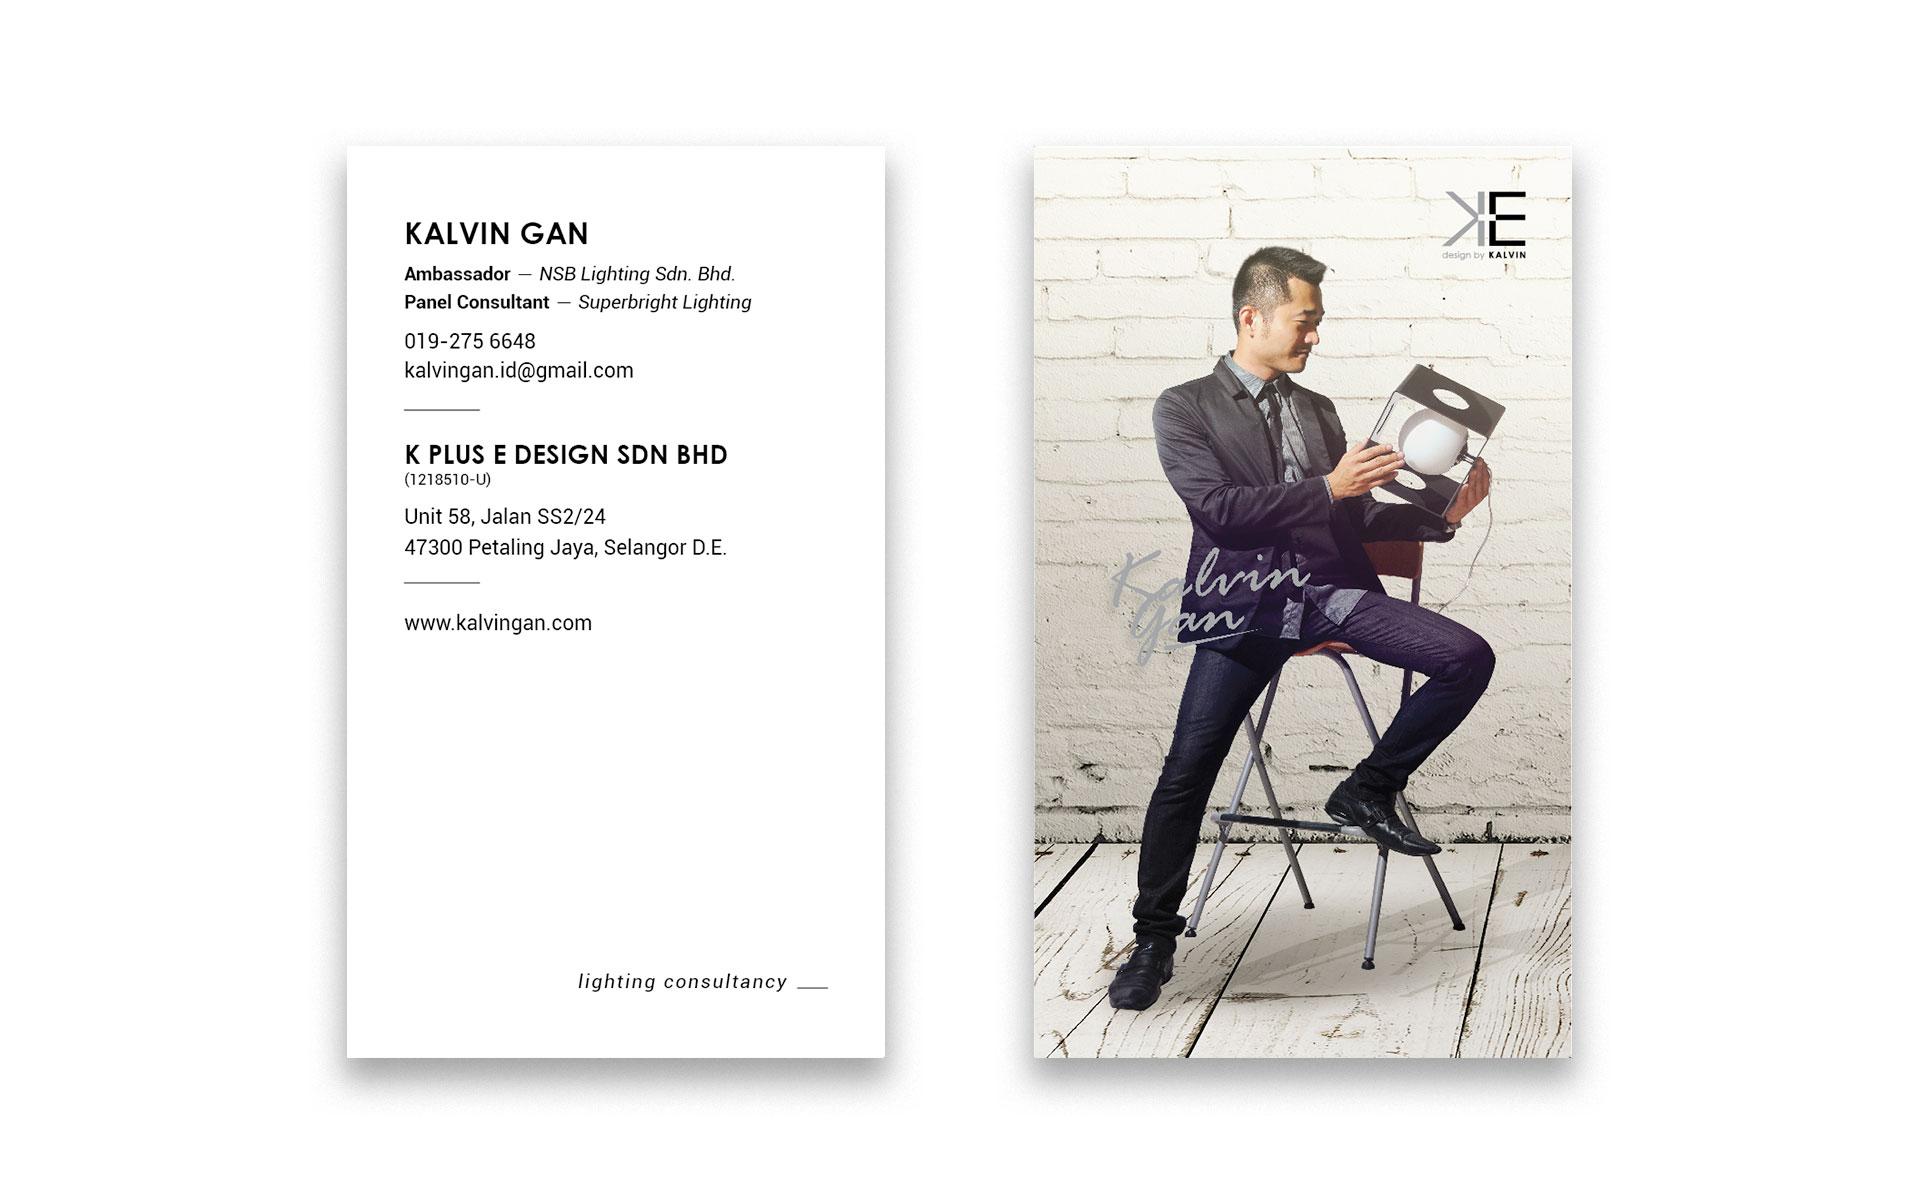 kalvin gan business card design